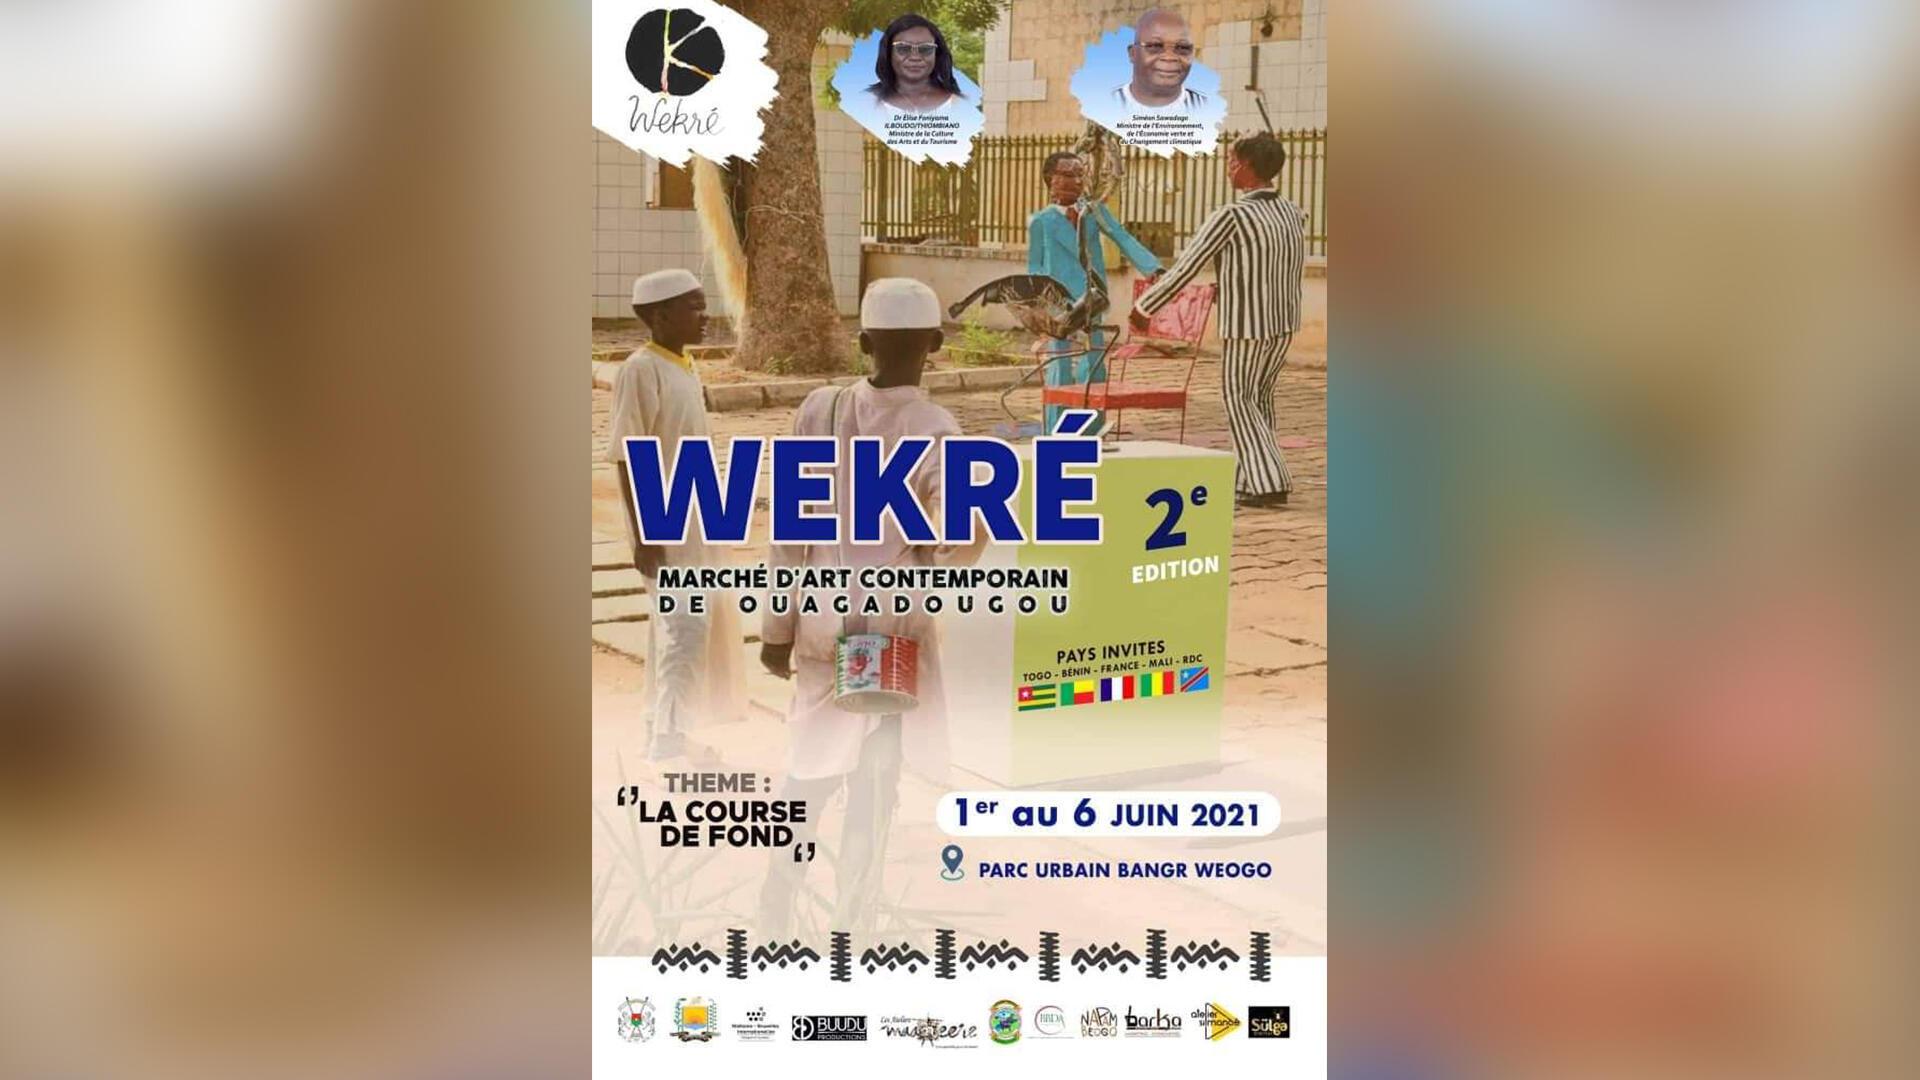 Burkina Faso - Ouagadougou - Wekré - Affiche